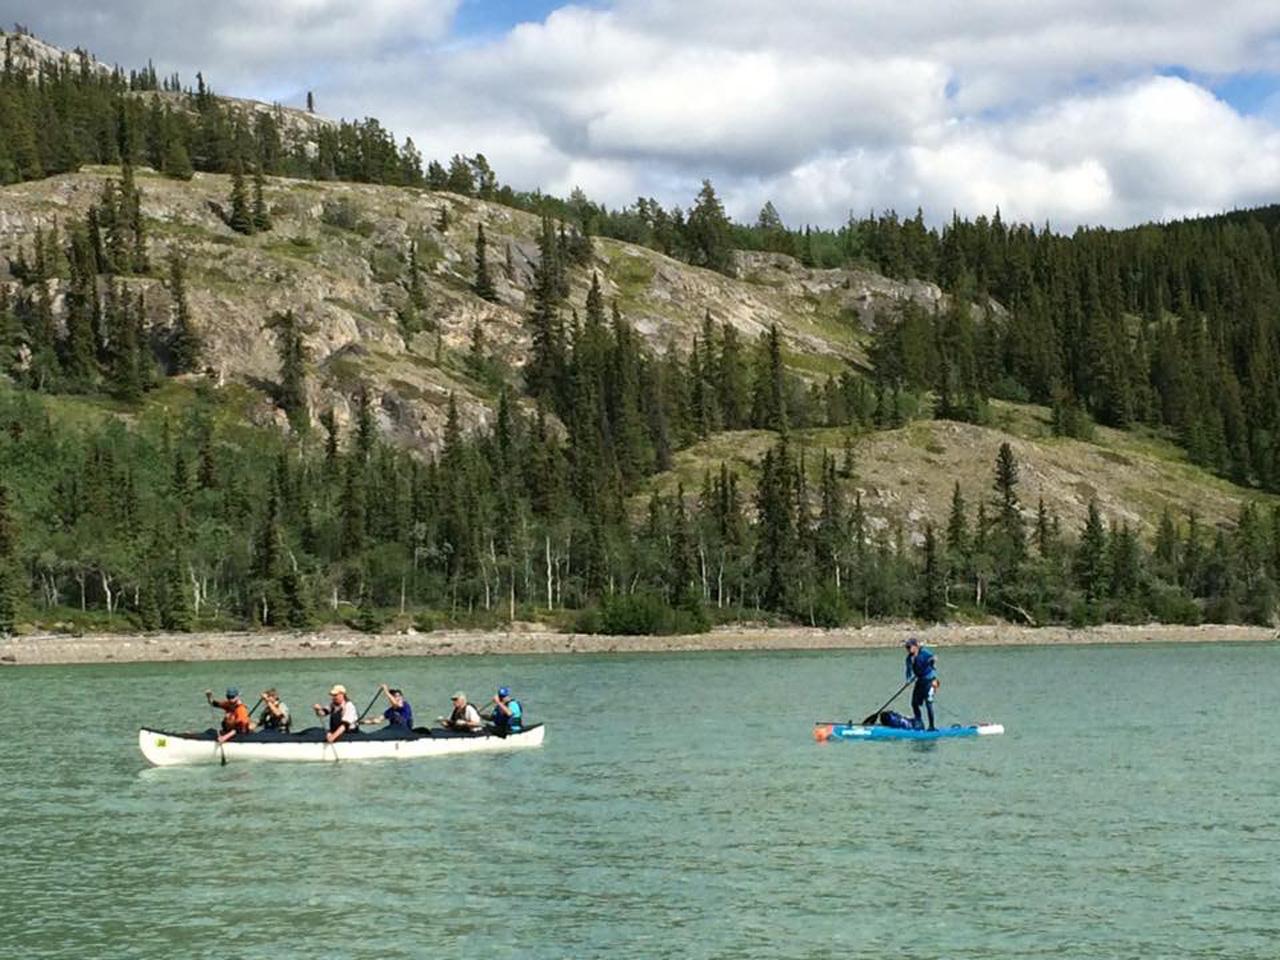 Starboard-SUP-Bart-de-Zwart-Conquers-The-2018-Yukon-River-Quest-4